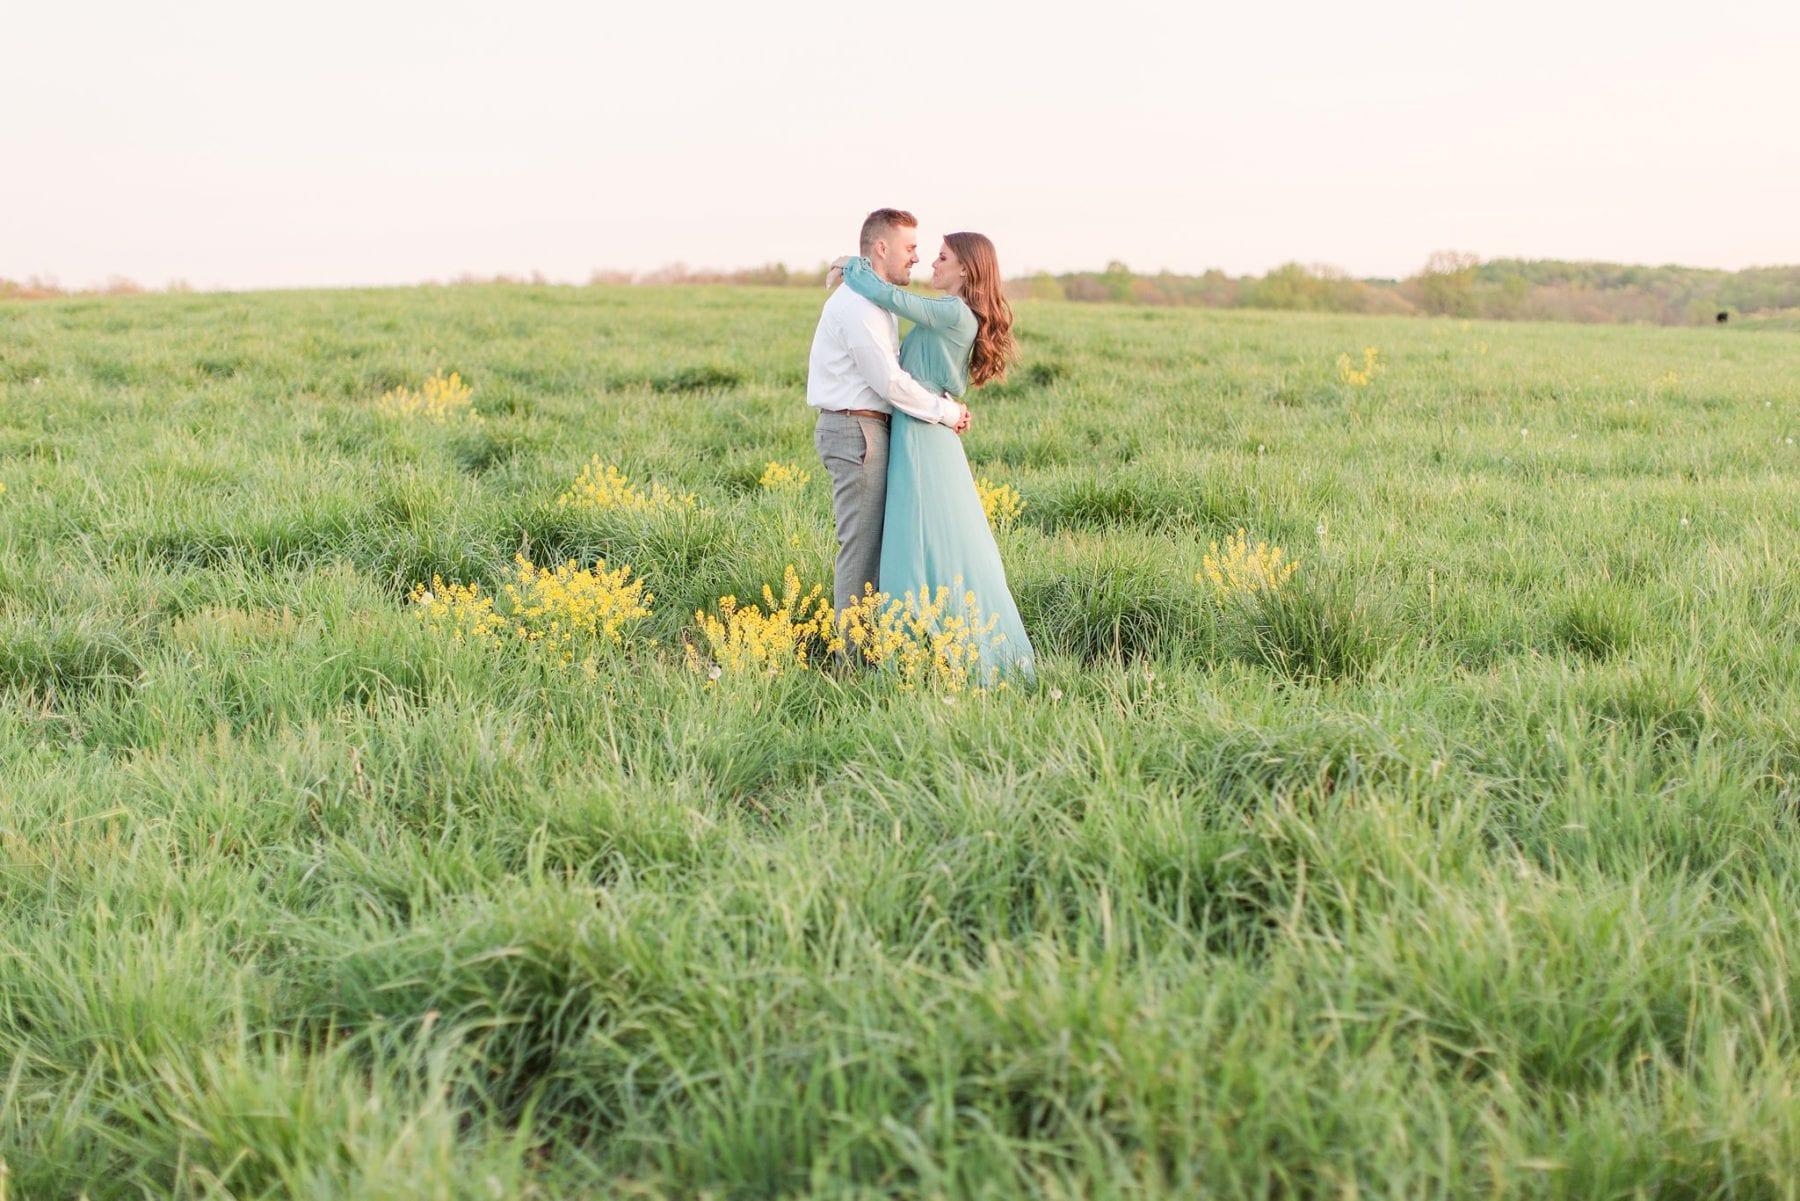 Goodstone Inn Engagement Session Virginia Wedding Photographer Megan Kelsey Photography-331.jpg